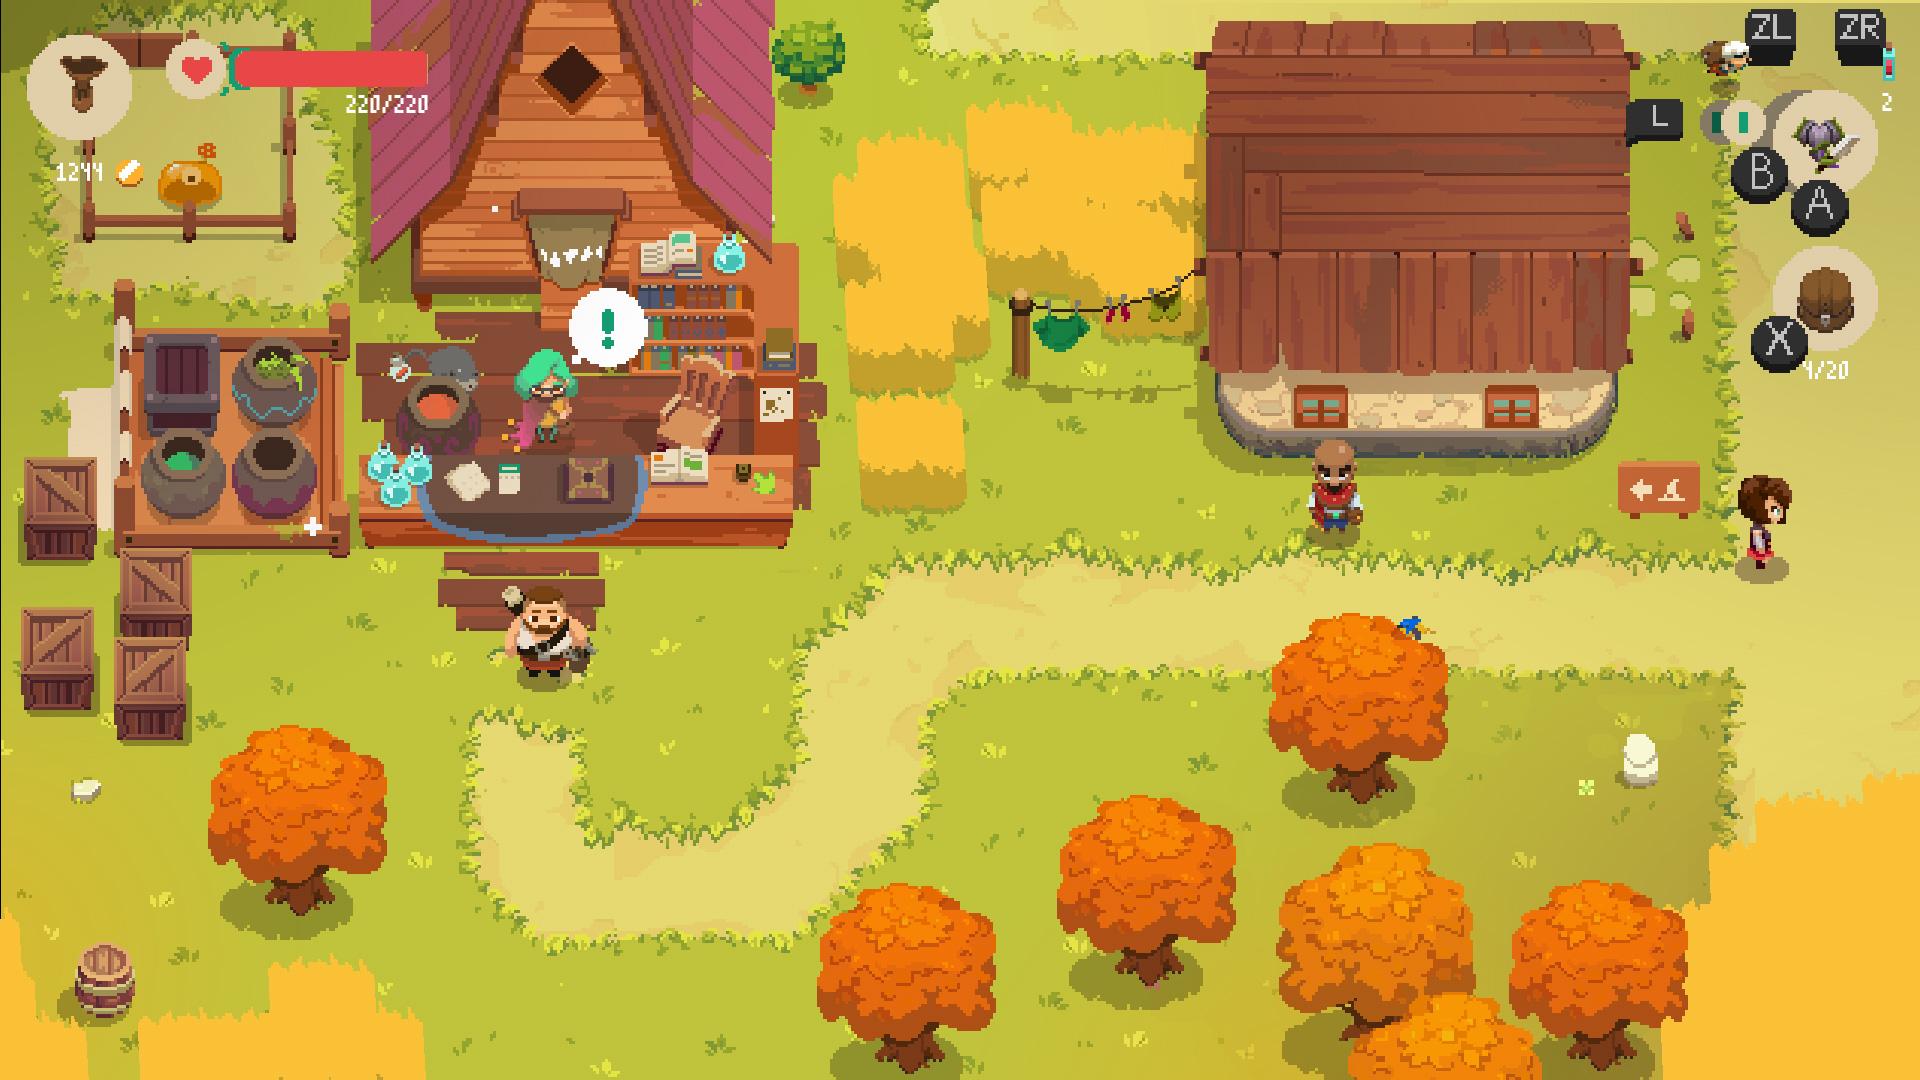 Dungeon-crawling shopkeeper RPG Moonlighter hits Switch in November screenshot